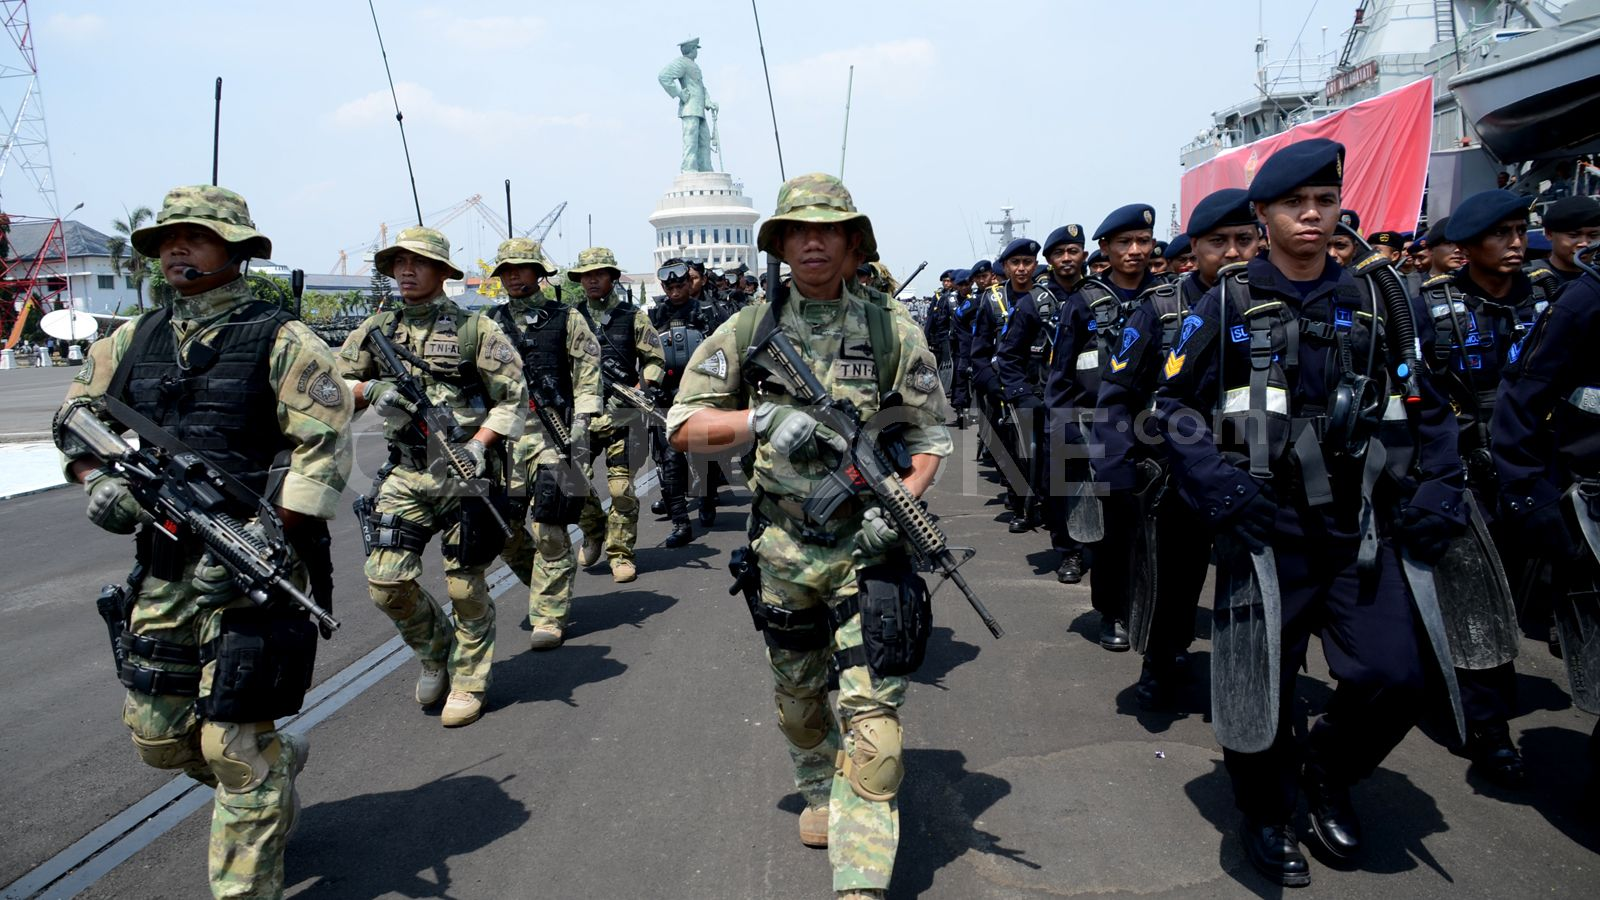 Tentara Nasional Indonesia Image Yndoril Mod DB